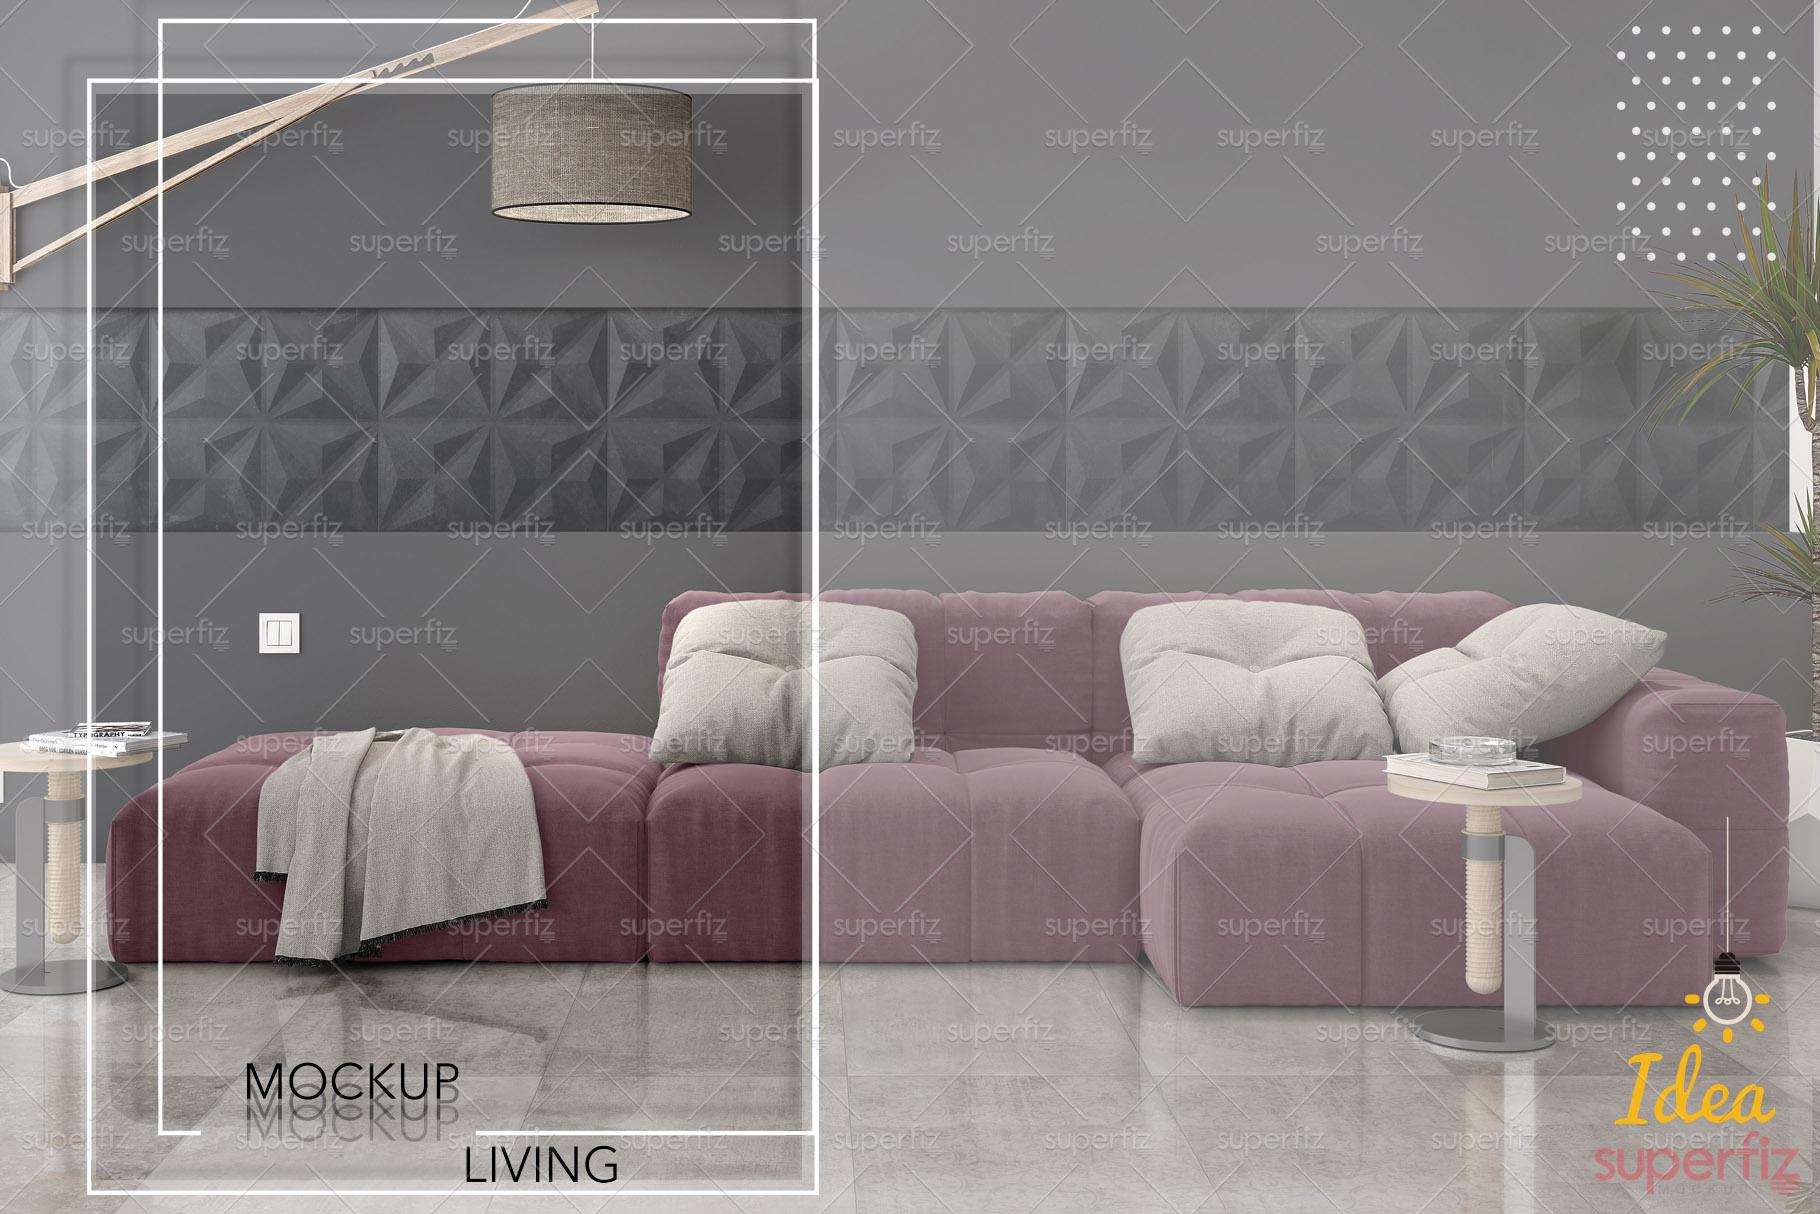 Floor and Wall PSD Mockup Livingroom SM87 example image 6